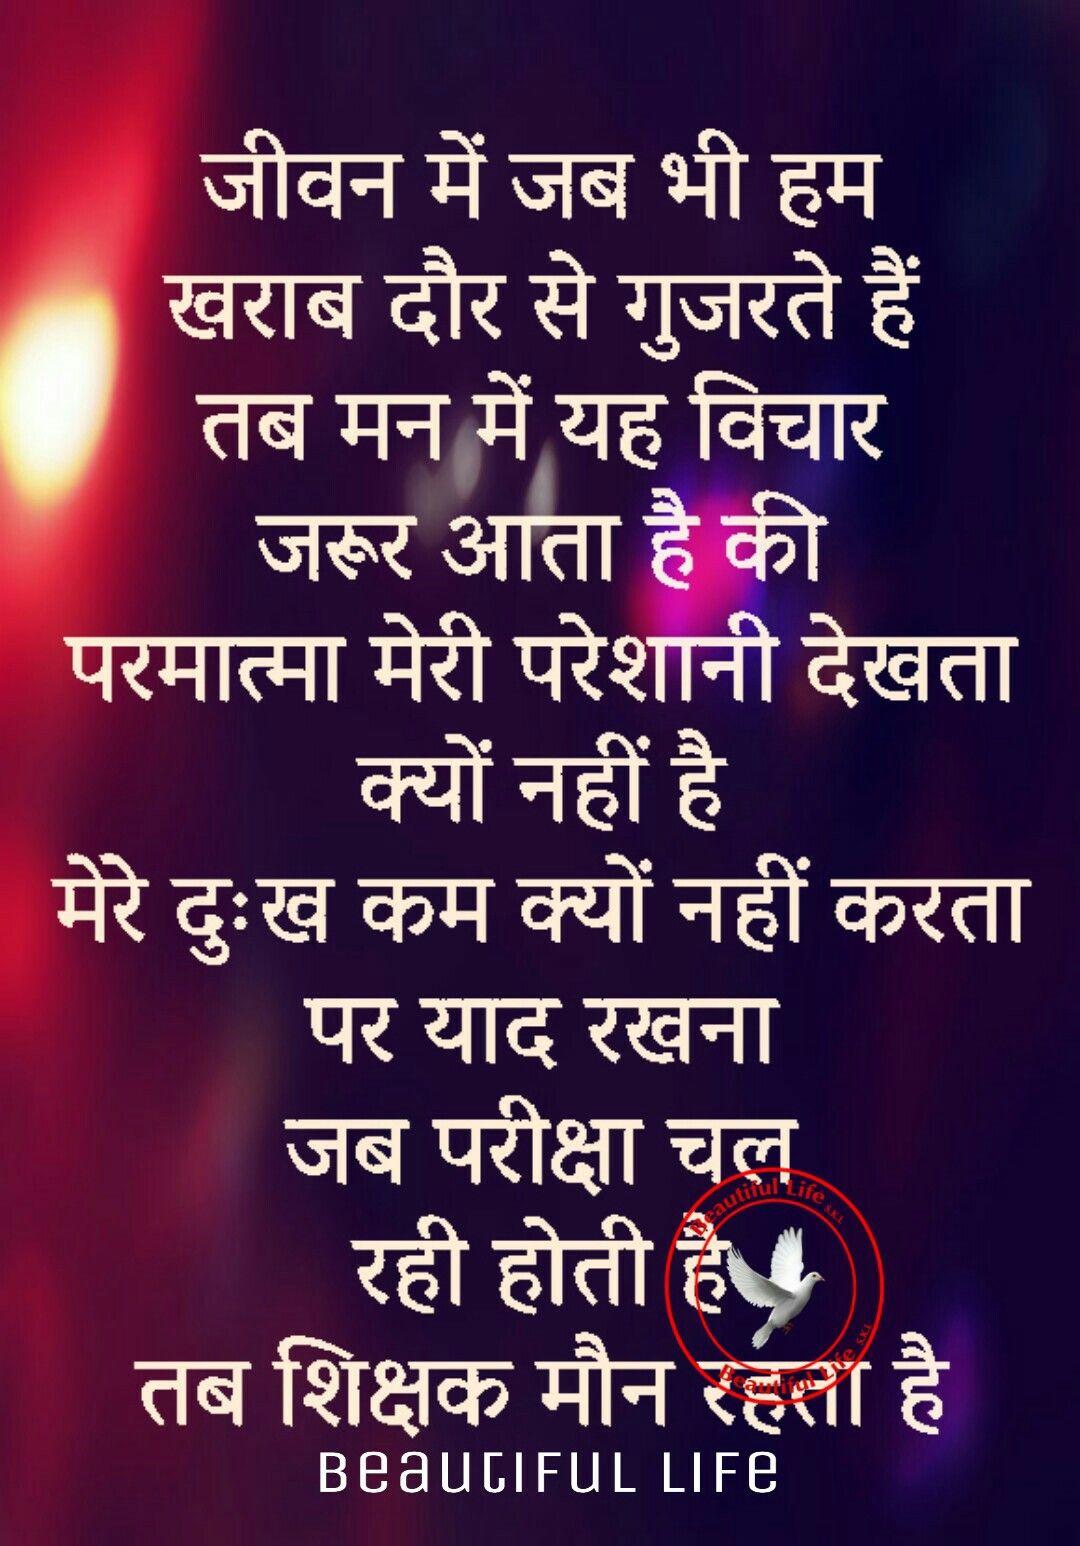 Pin By Dr Payal On Beatiful Life Skl Hindi Punjabi Quotes Part 1 Good Thoughts Quotes Inspirational Quotes Pictures Motivational Picture Quotes